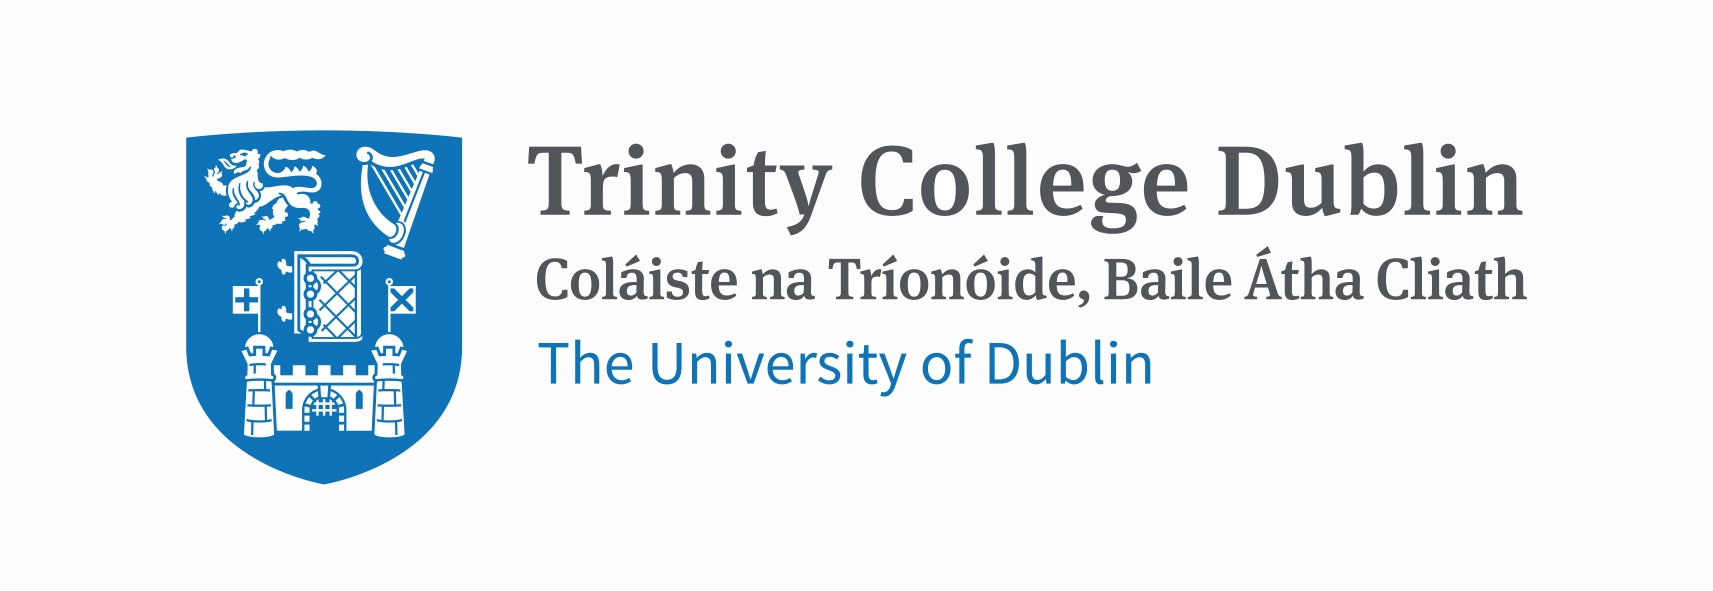 Trinity College Dublin (TCD)